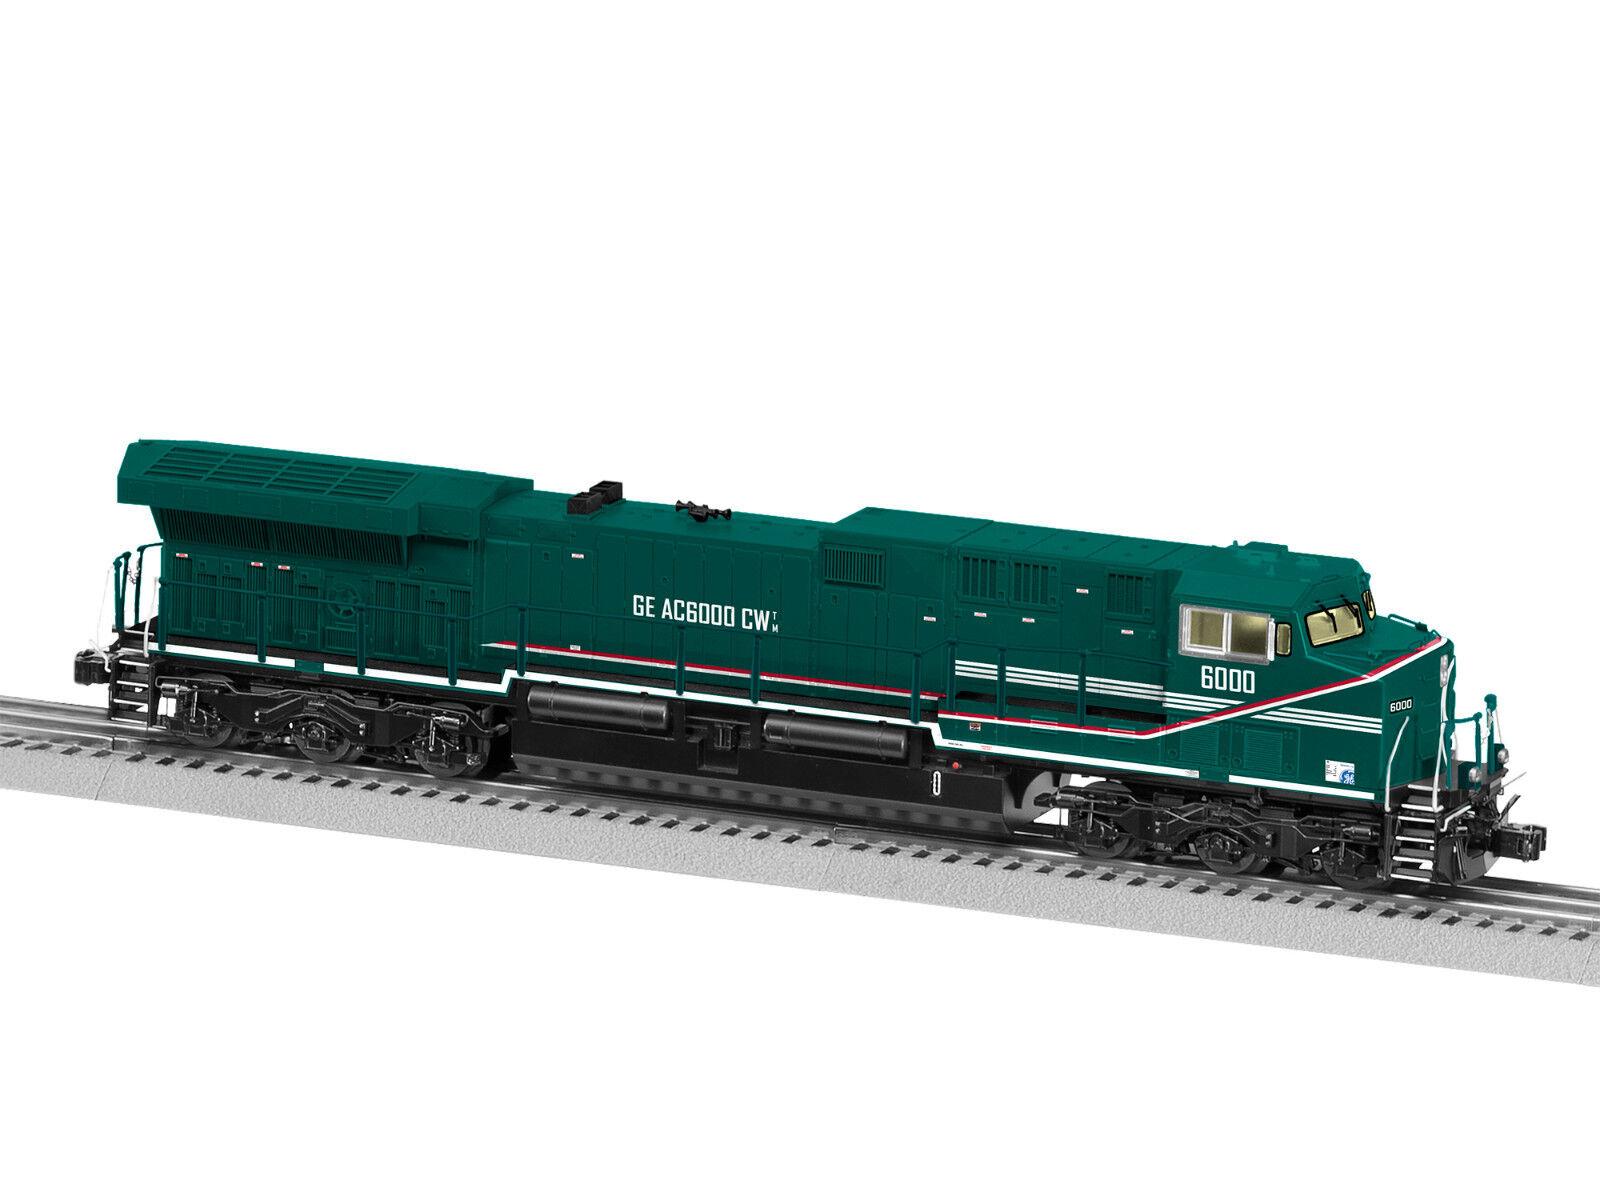 Lionel  884843 Gemini exclusivo demostrador legado AC6000  6000 Locomotora Diesel